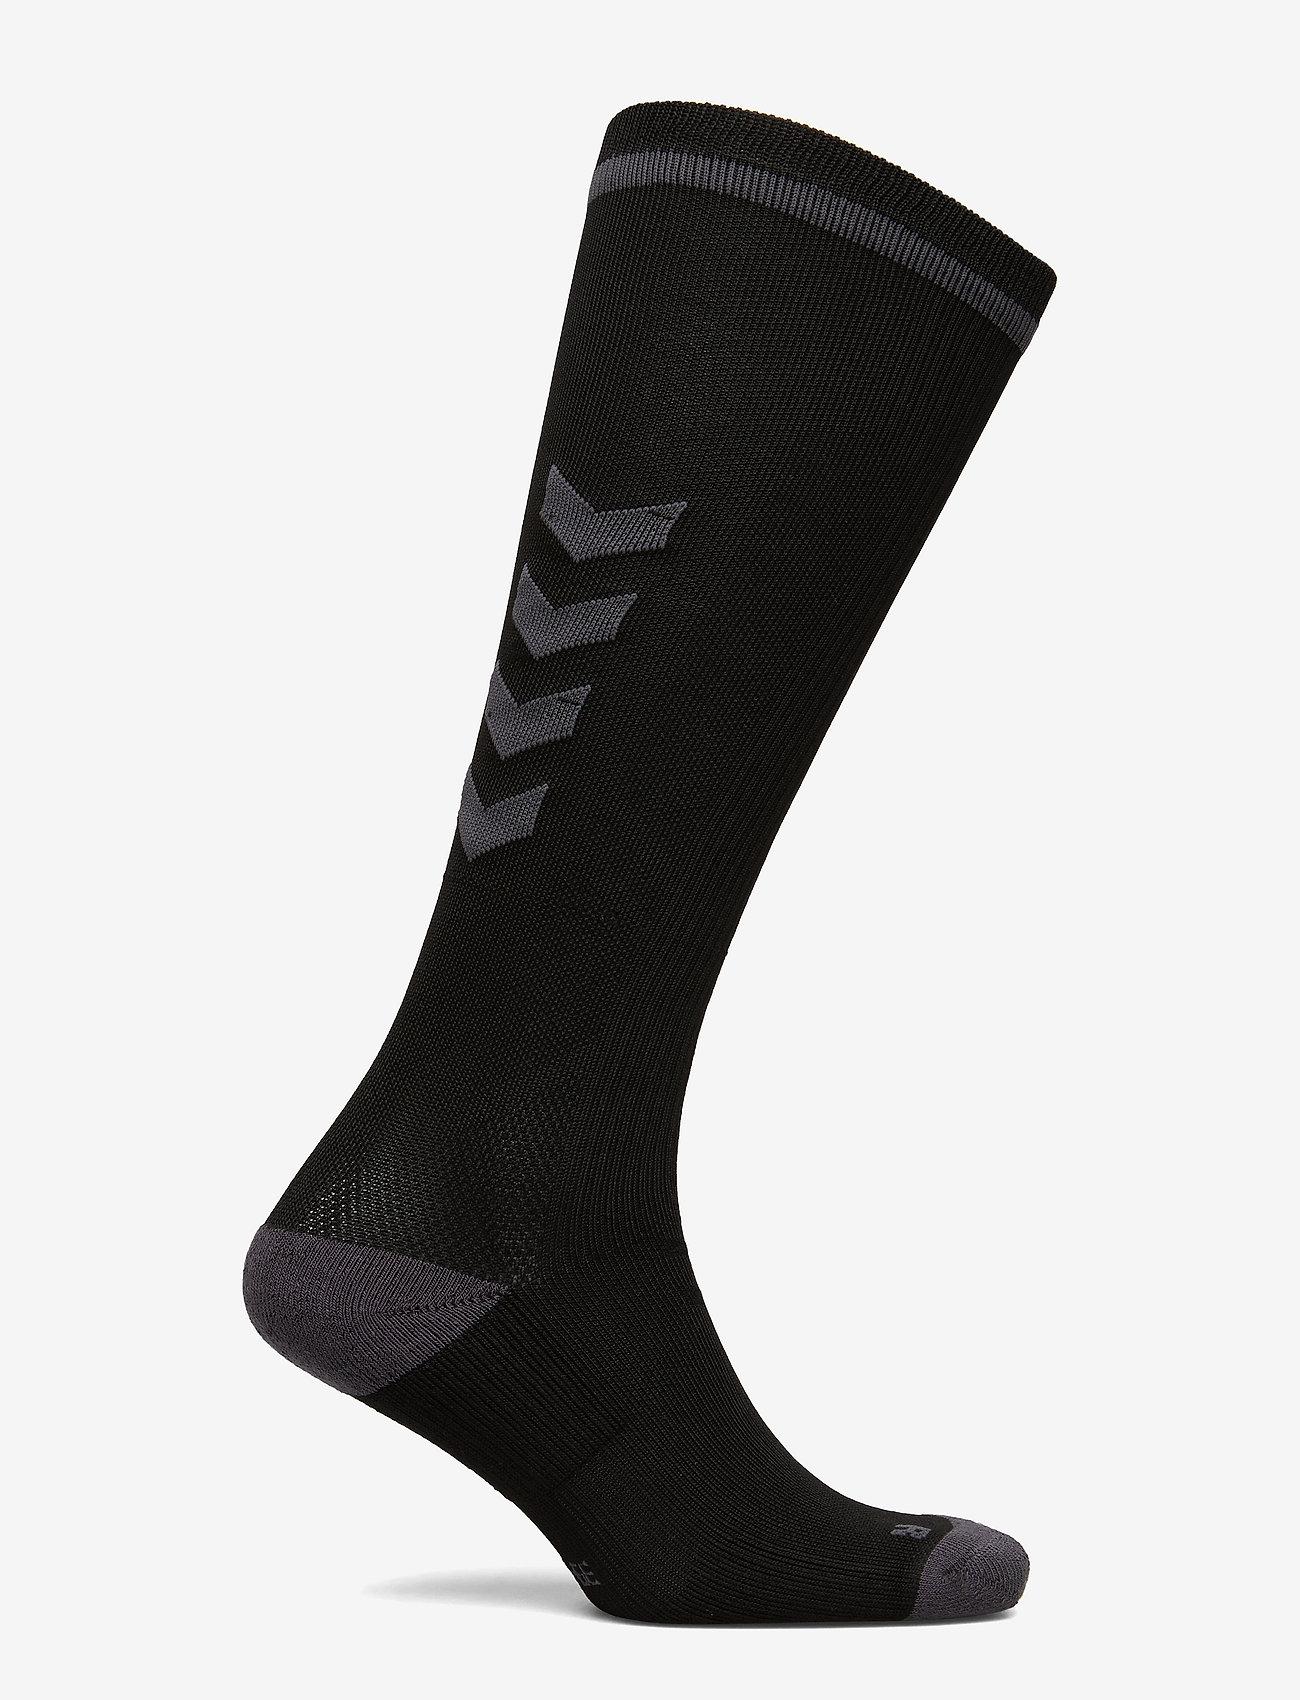 Hummel - ELITE INDOOR SOCK HIGH - jalkapallosukat - black/asphalt - 1